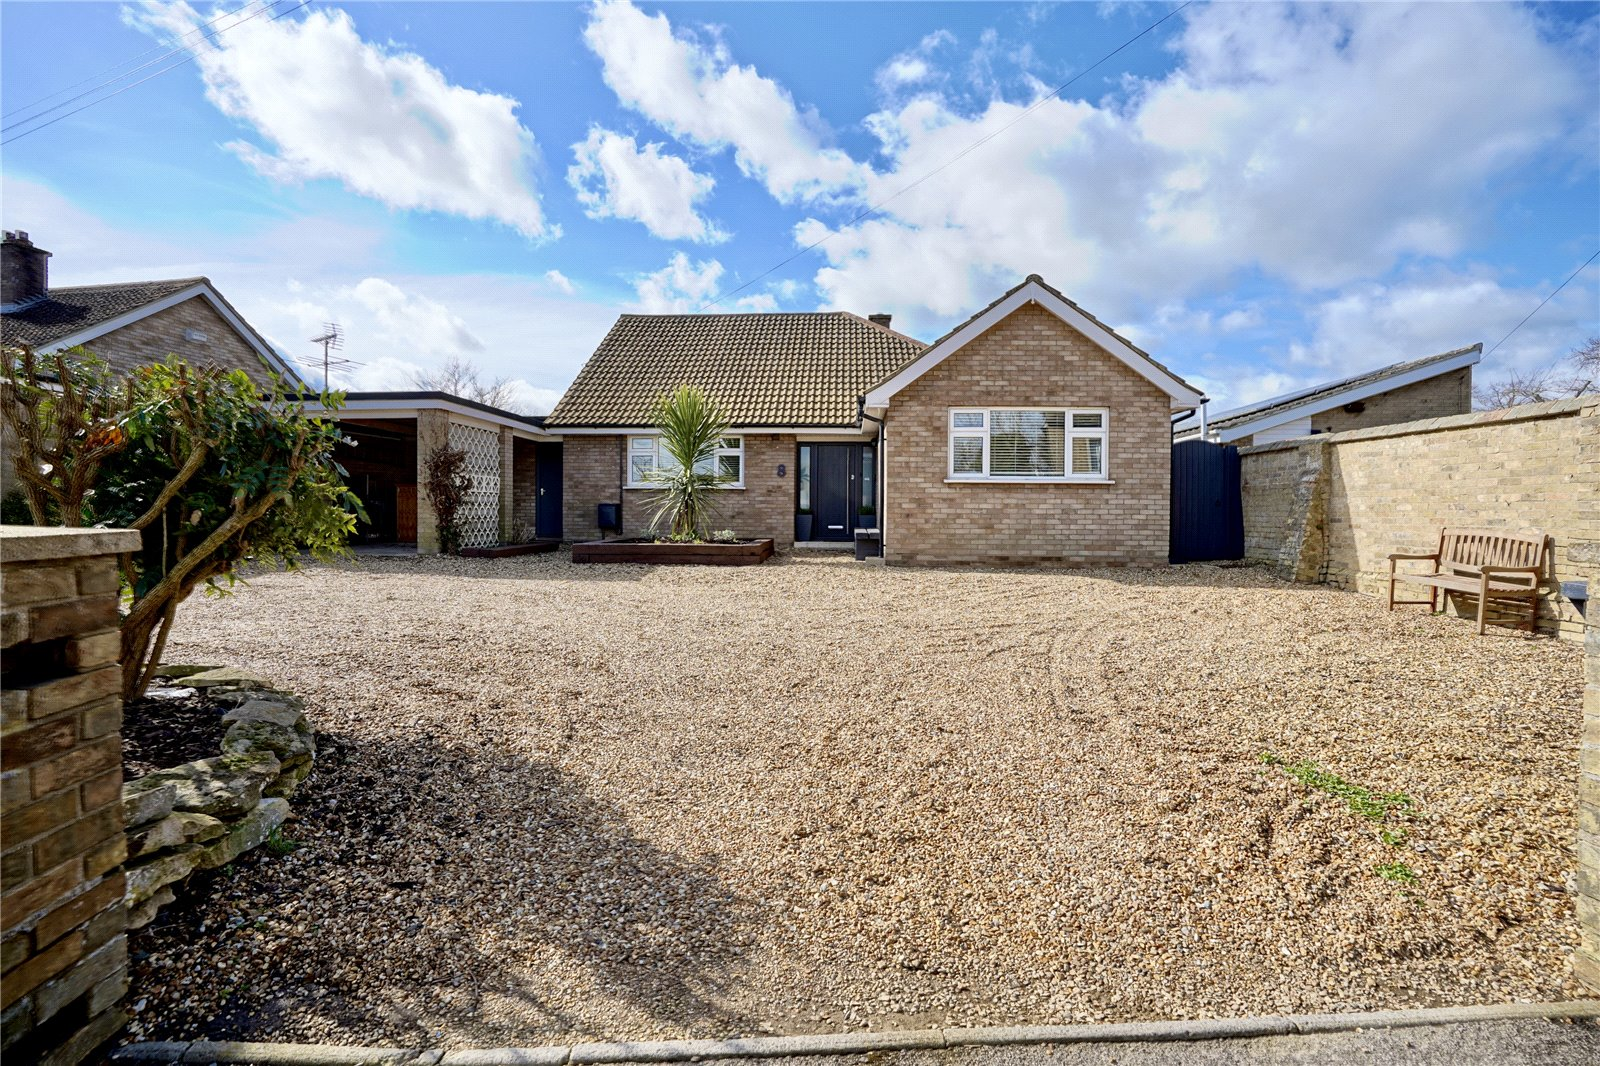 3 bed bungalow for sale in Howitts Lane, Eynesbury, PE19